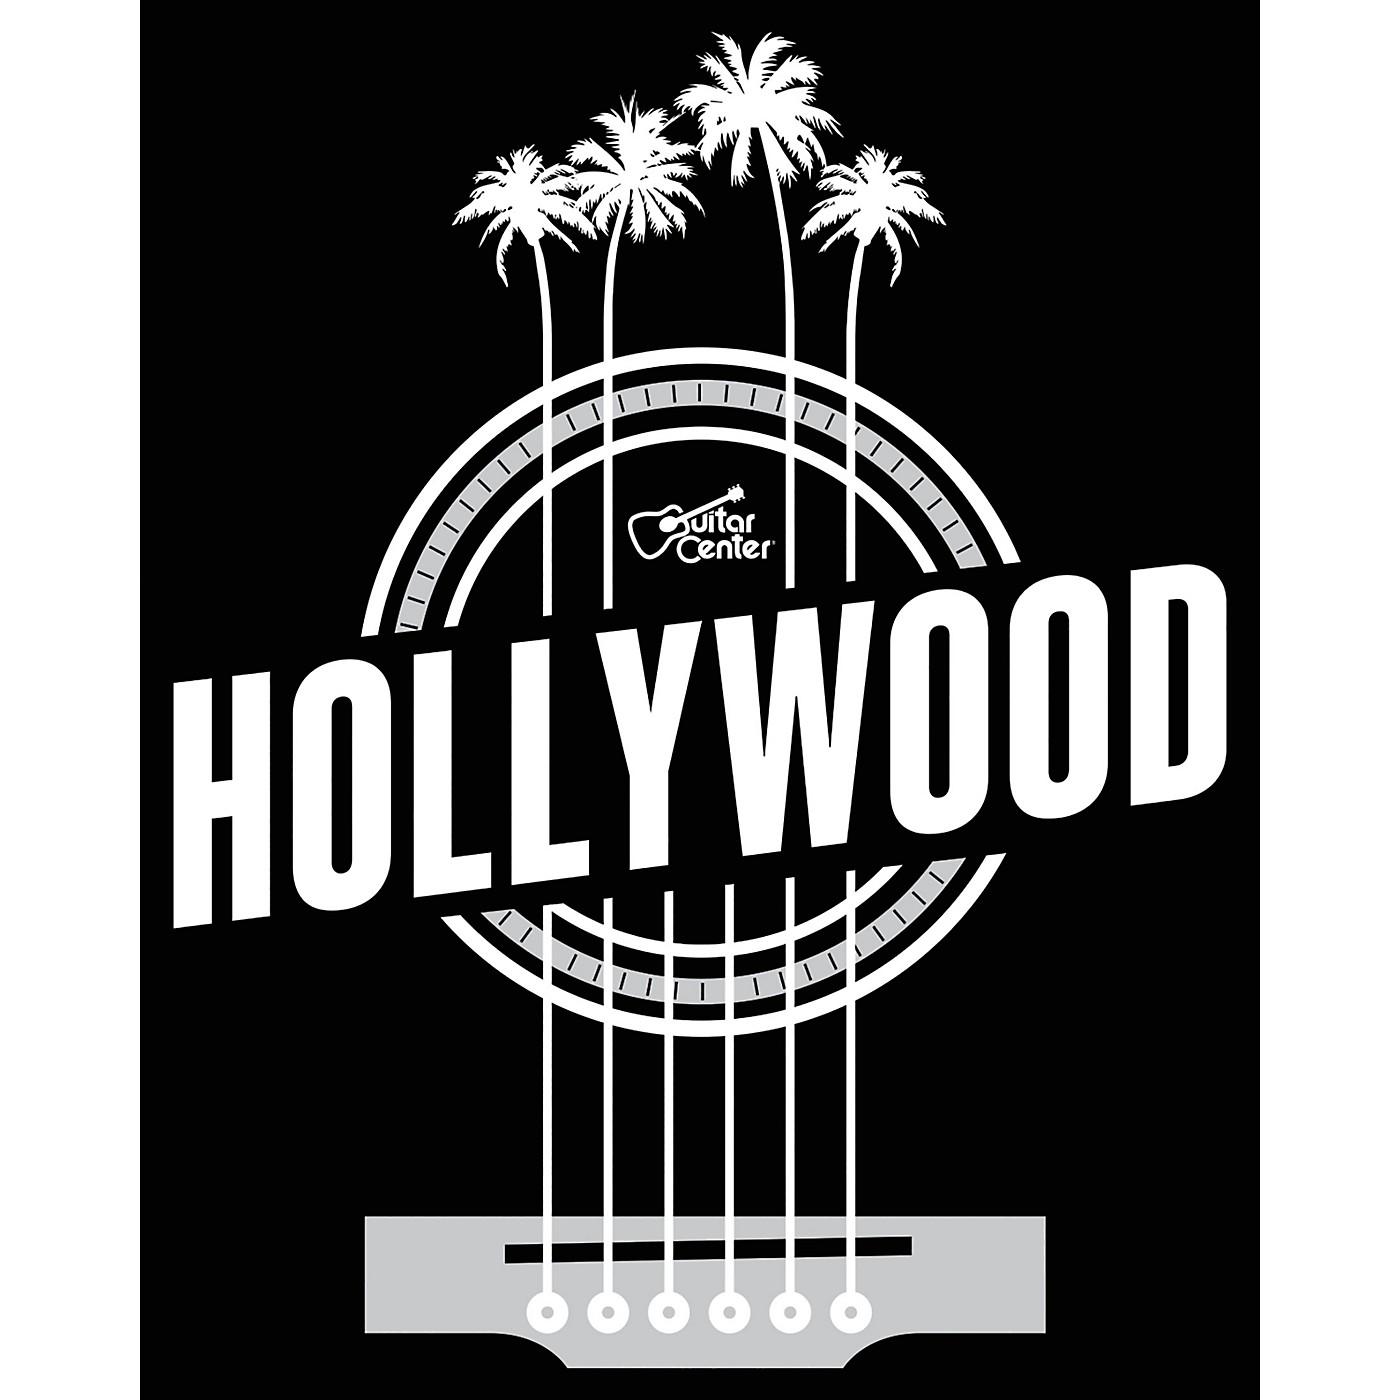 Guitar Center Hollywood Palm Strings - Black/White Magnet thumbnail